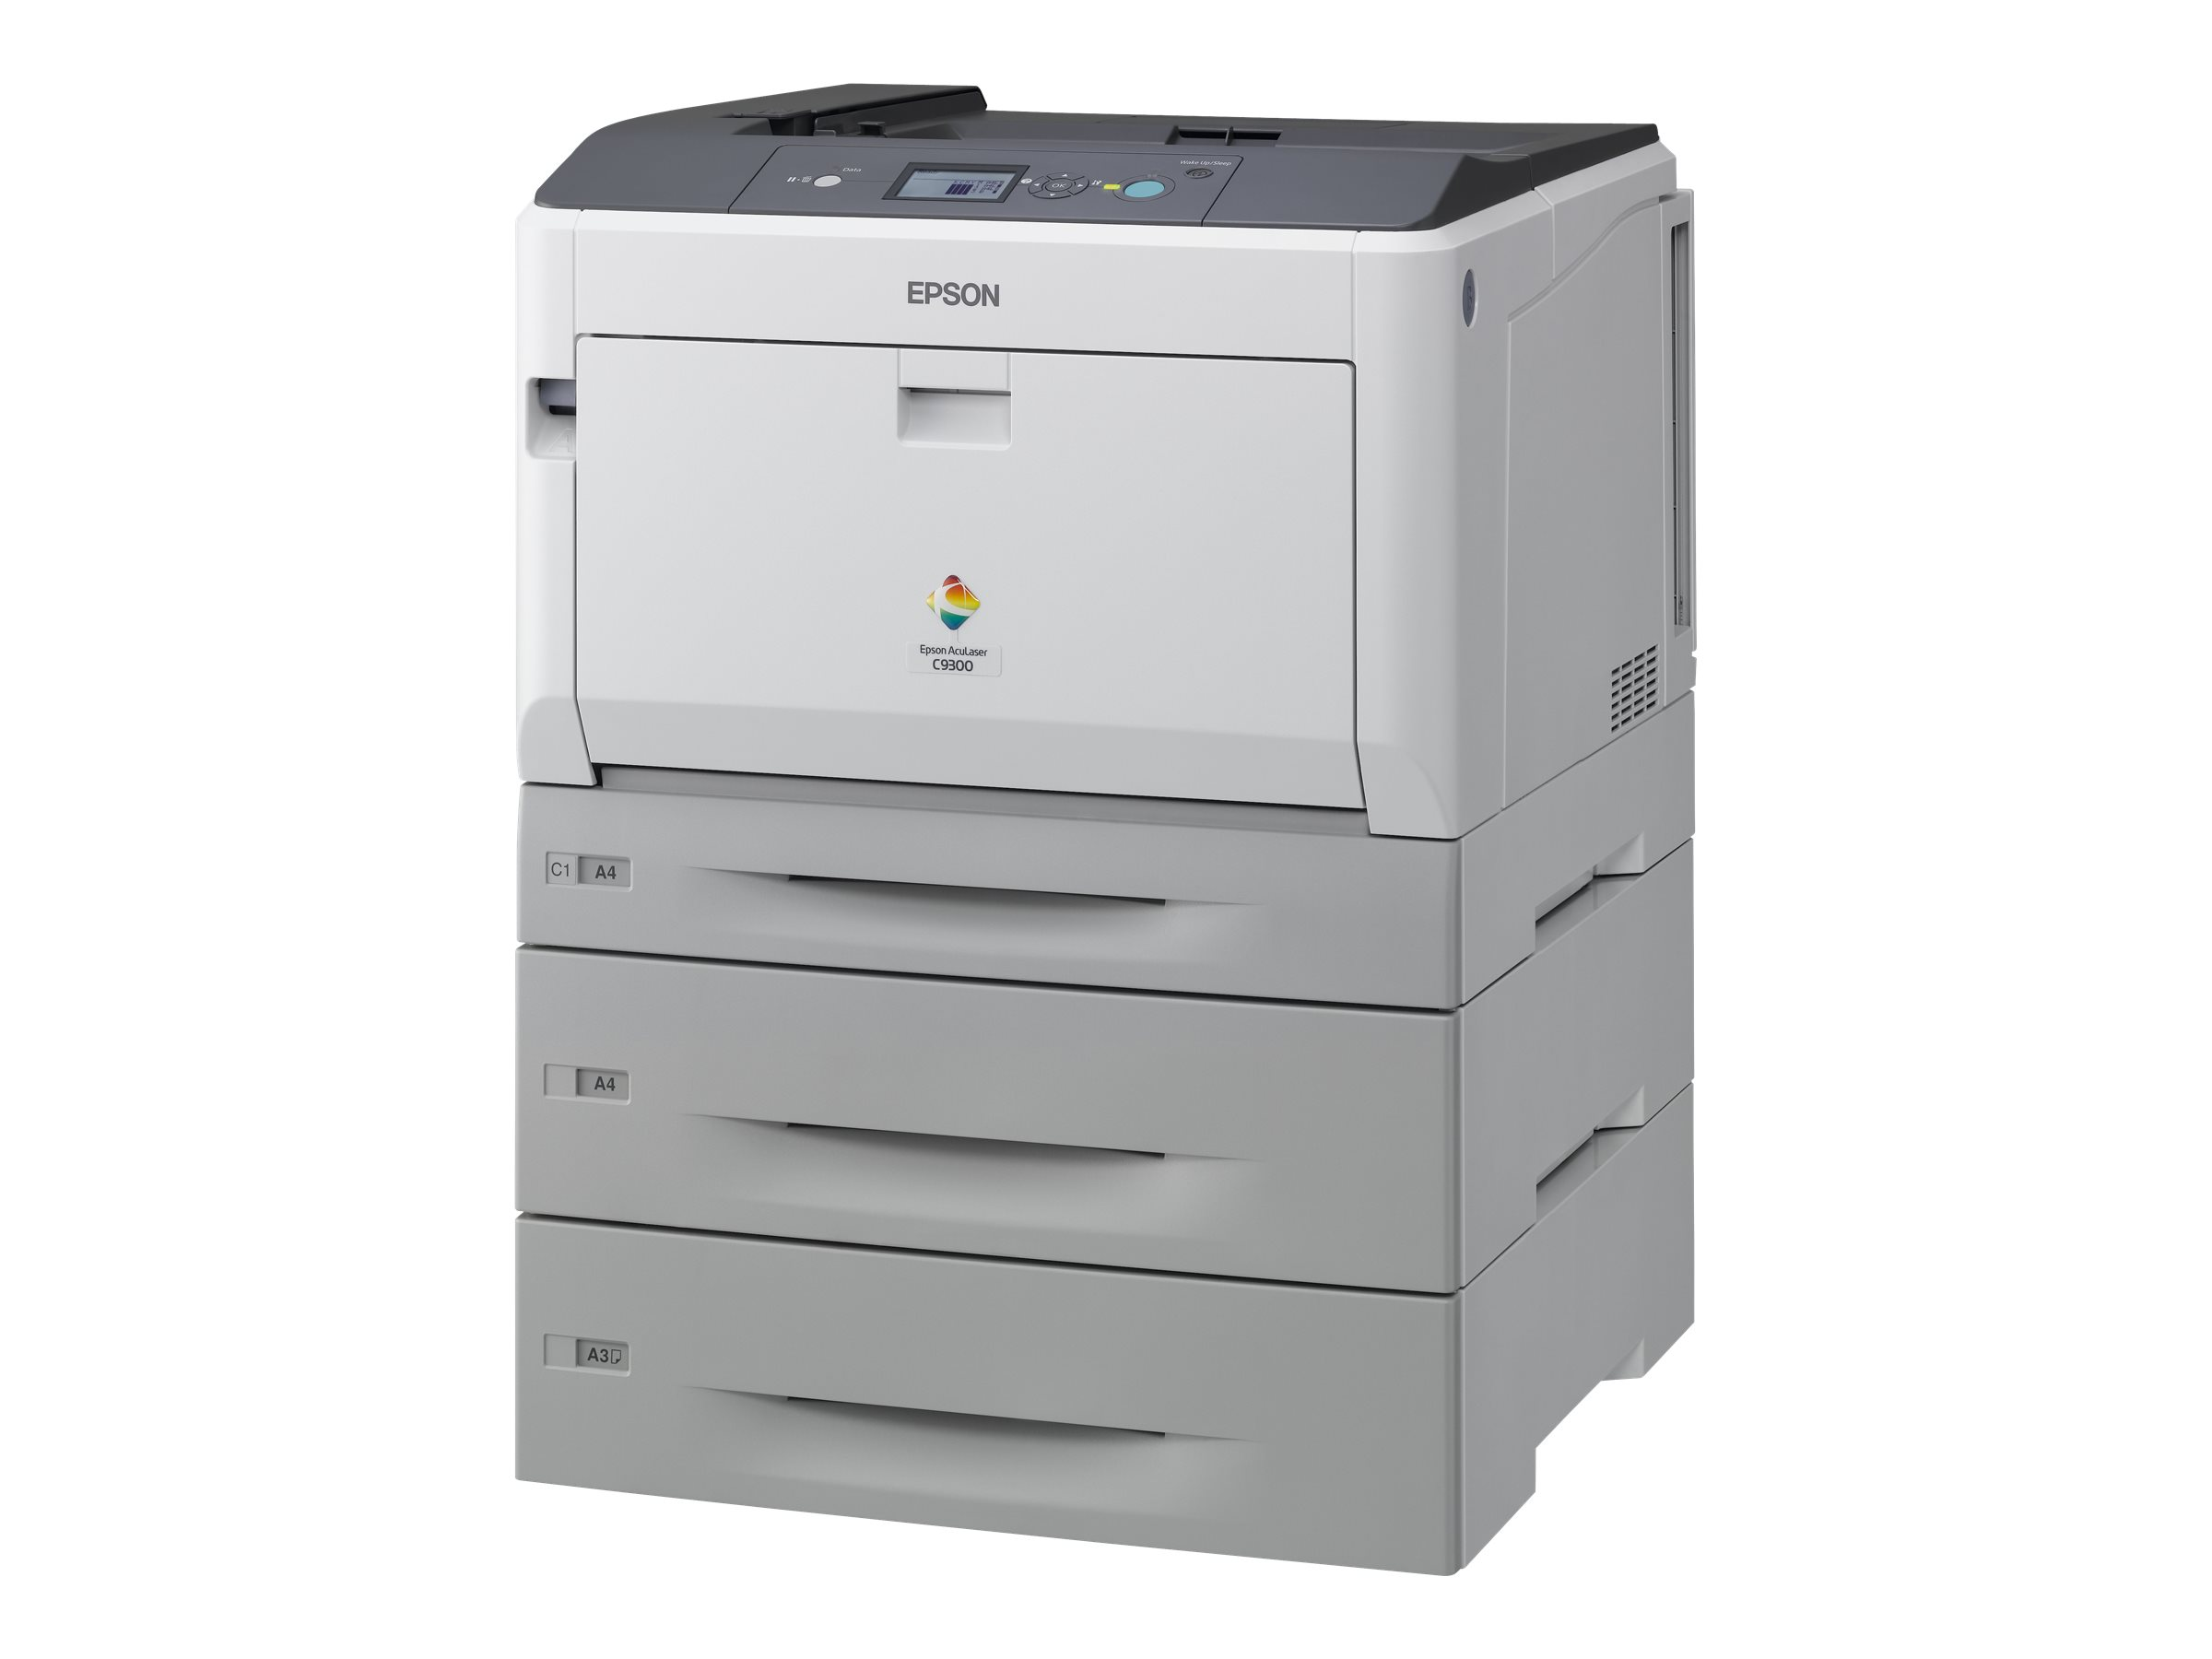 Epson AcuLaser C9300D2TN - Drucker - Farbe - Duplex - Laser - A3/Ledger